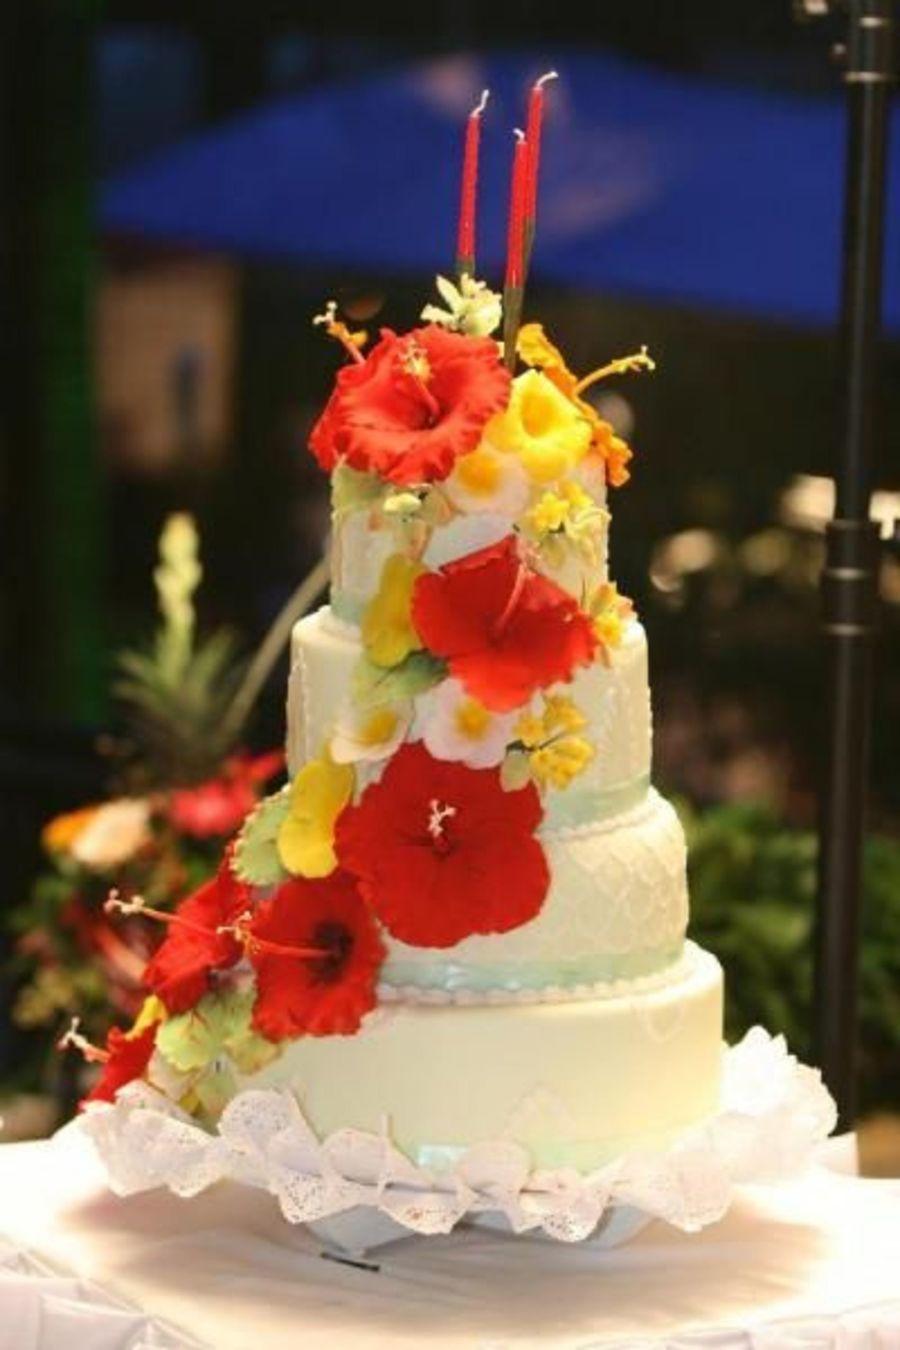 Hawaiian Themed Wedding Cake This Is A Bigger Picture Of The Same Wedding Cake Hawaiian Wedding Cake Tropical Wedding Cake Hawaii Wedding Cake